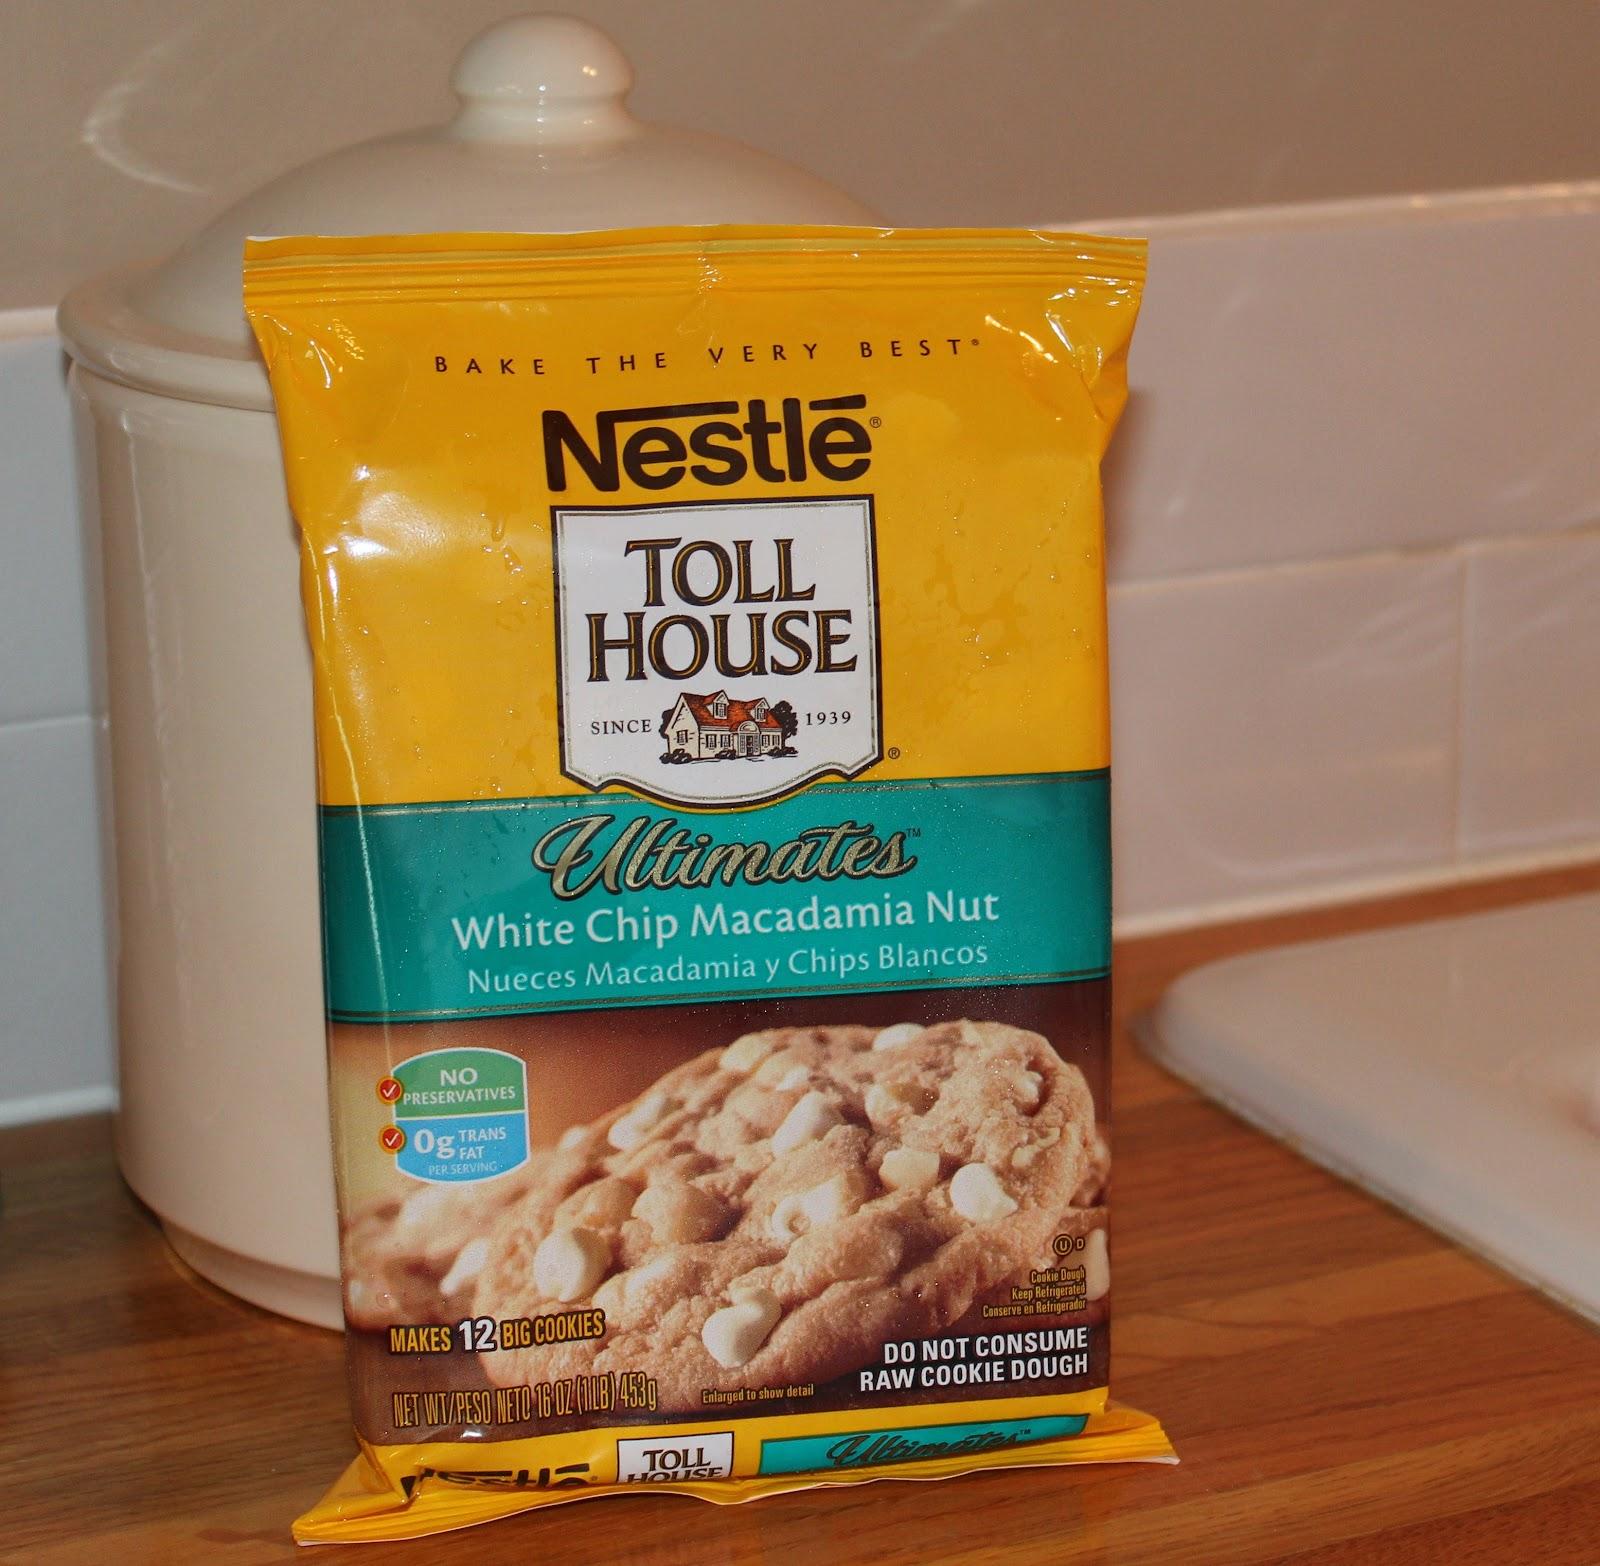 Nestle toll house white chocolate chip macadamia nut cookies